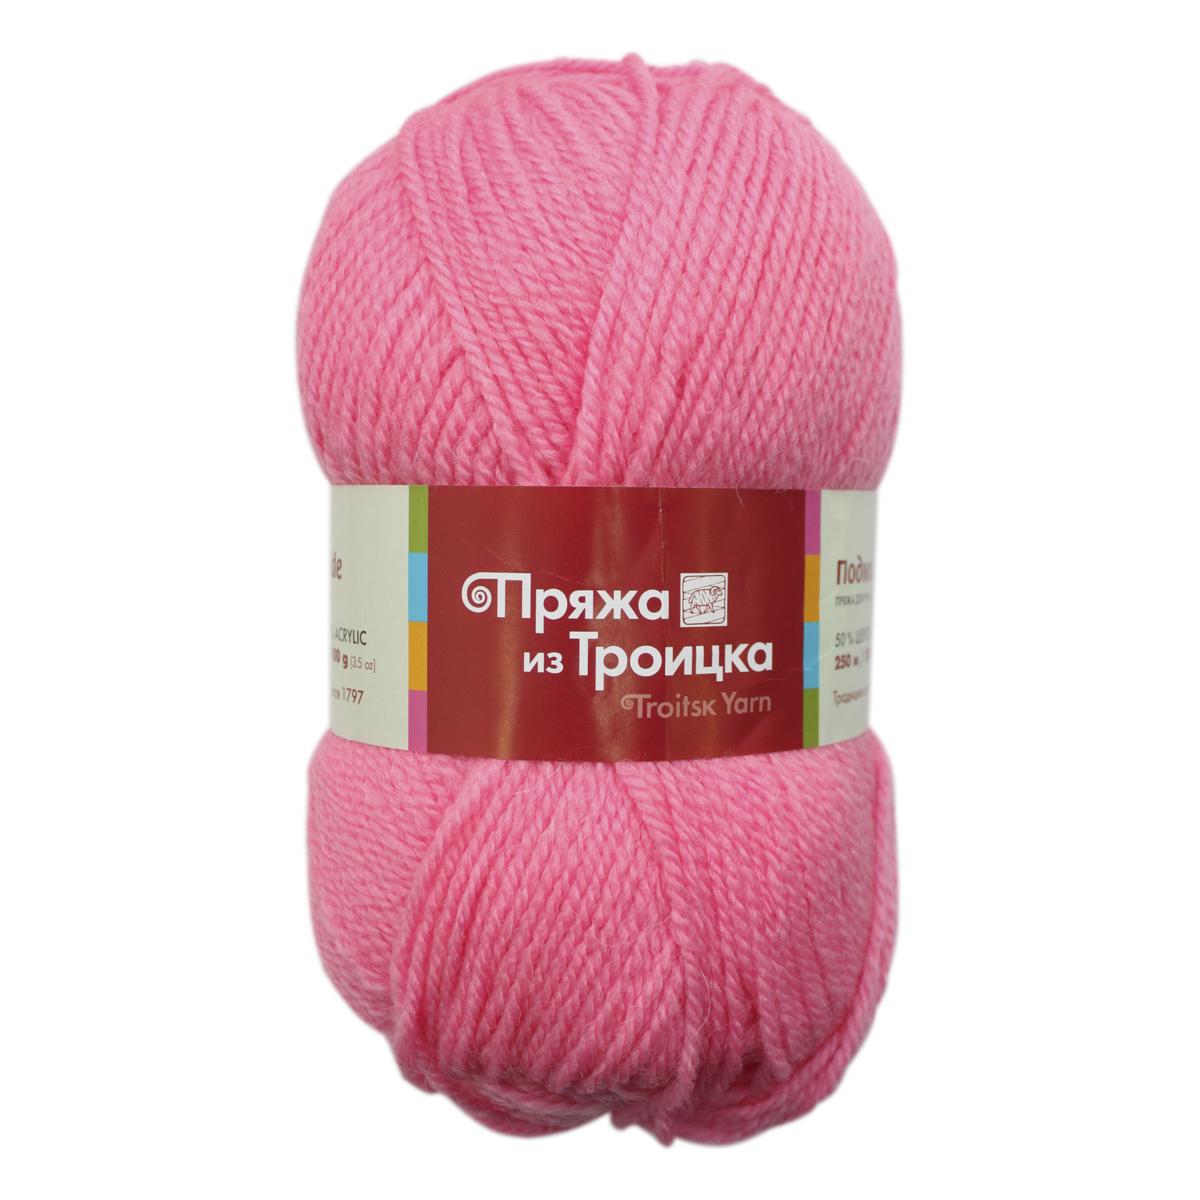 Пряжа для вязания Подмосковная, 100 г, 250 м, цвет: 0160 розовый, 10 шт366001_0160